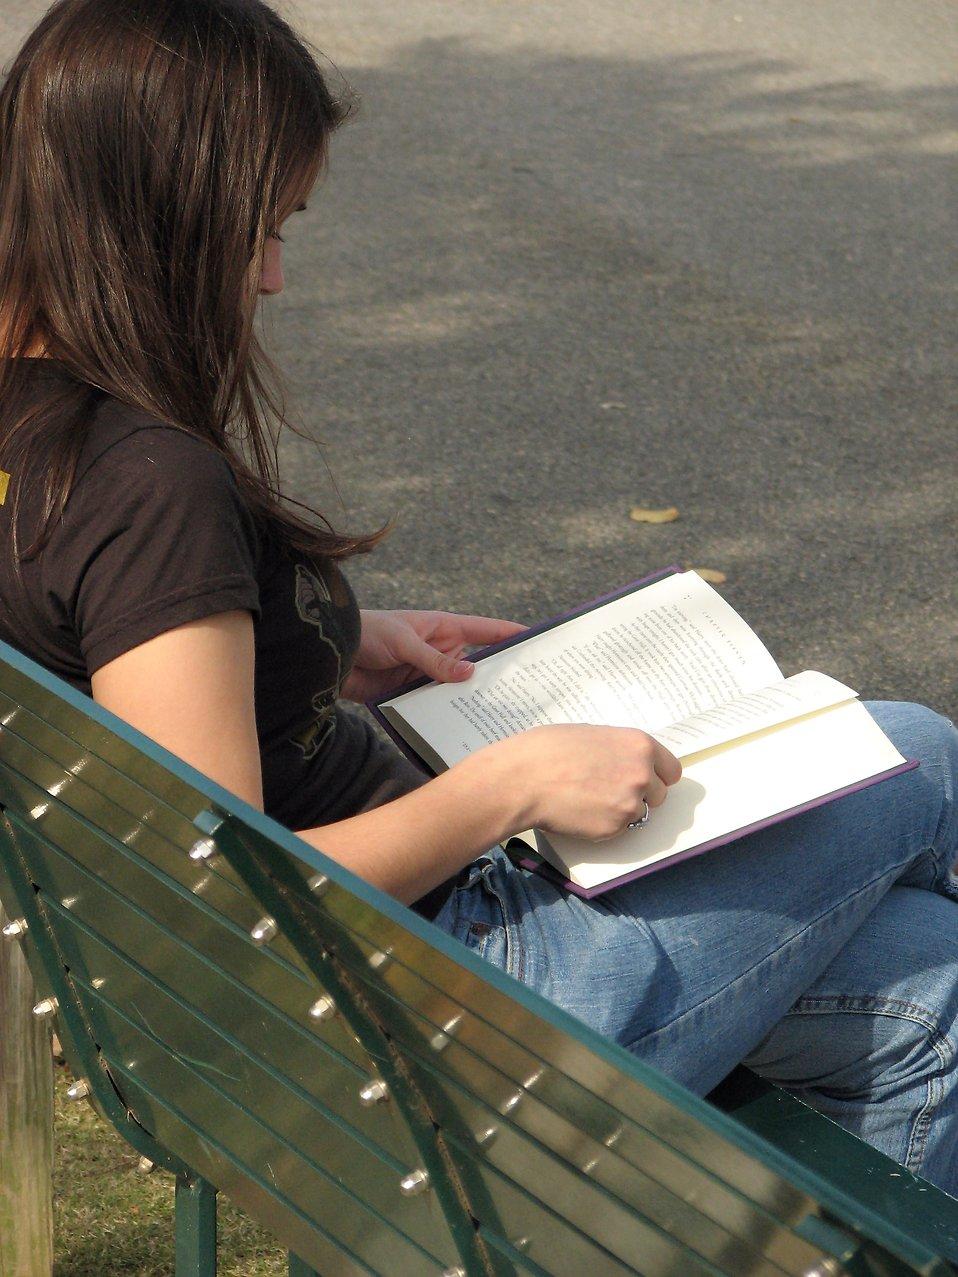 Teenage girl reading a book : Free Stock Photo